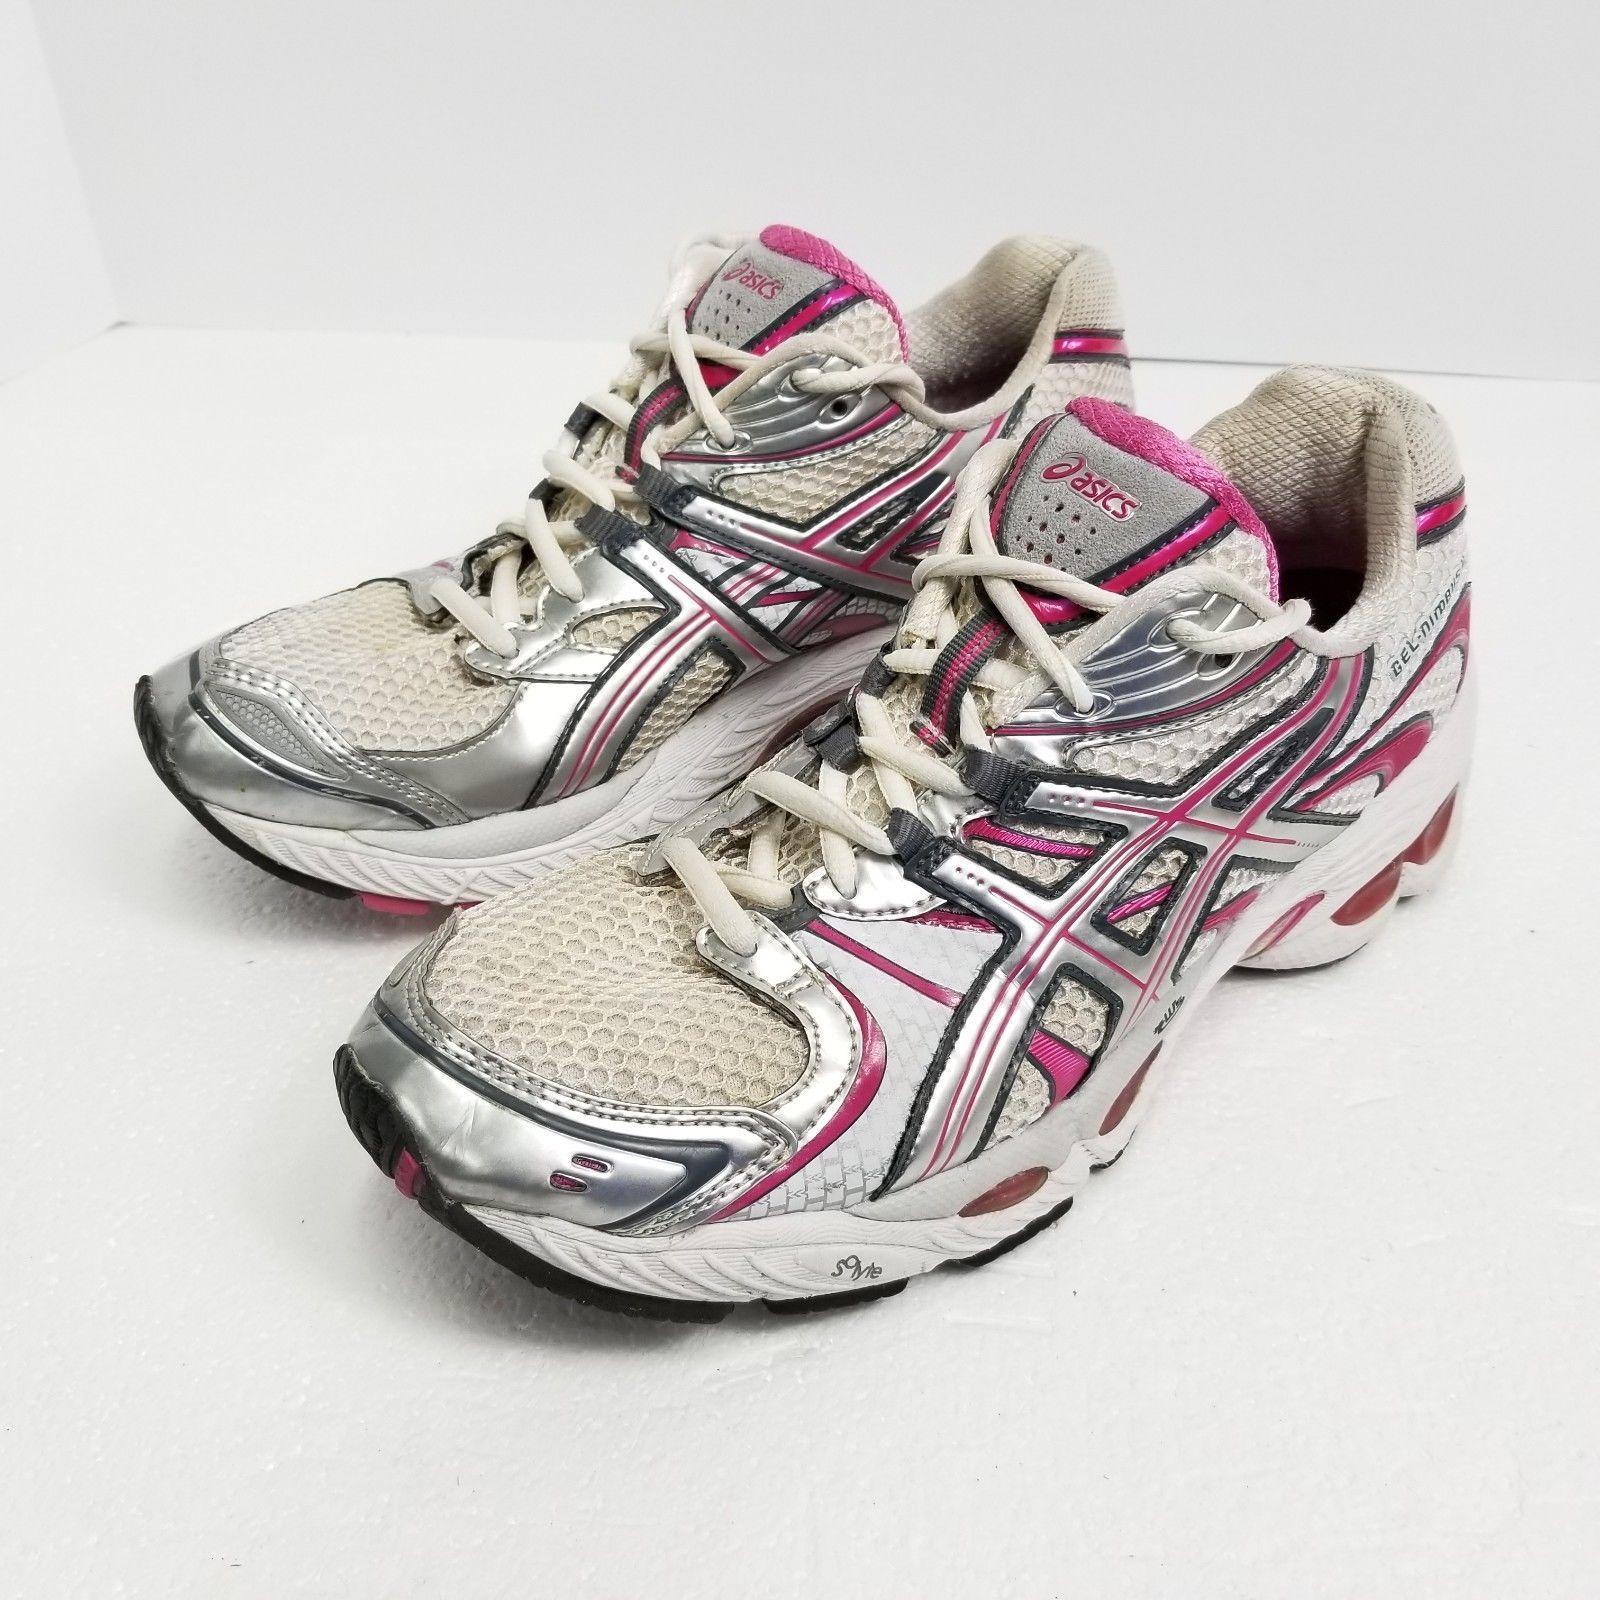 quality design df957 3297e Asics Gel Nimbus 11 Womens Running Shoes Size 10 White Pink Silver T991N  Train